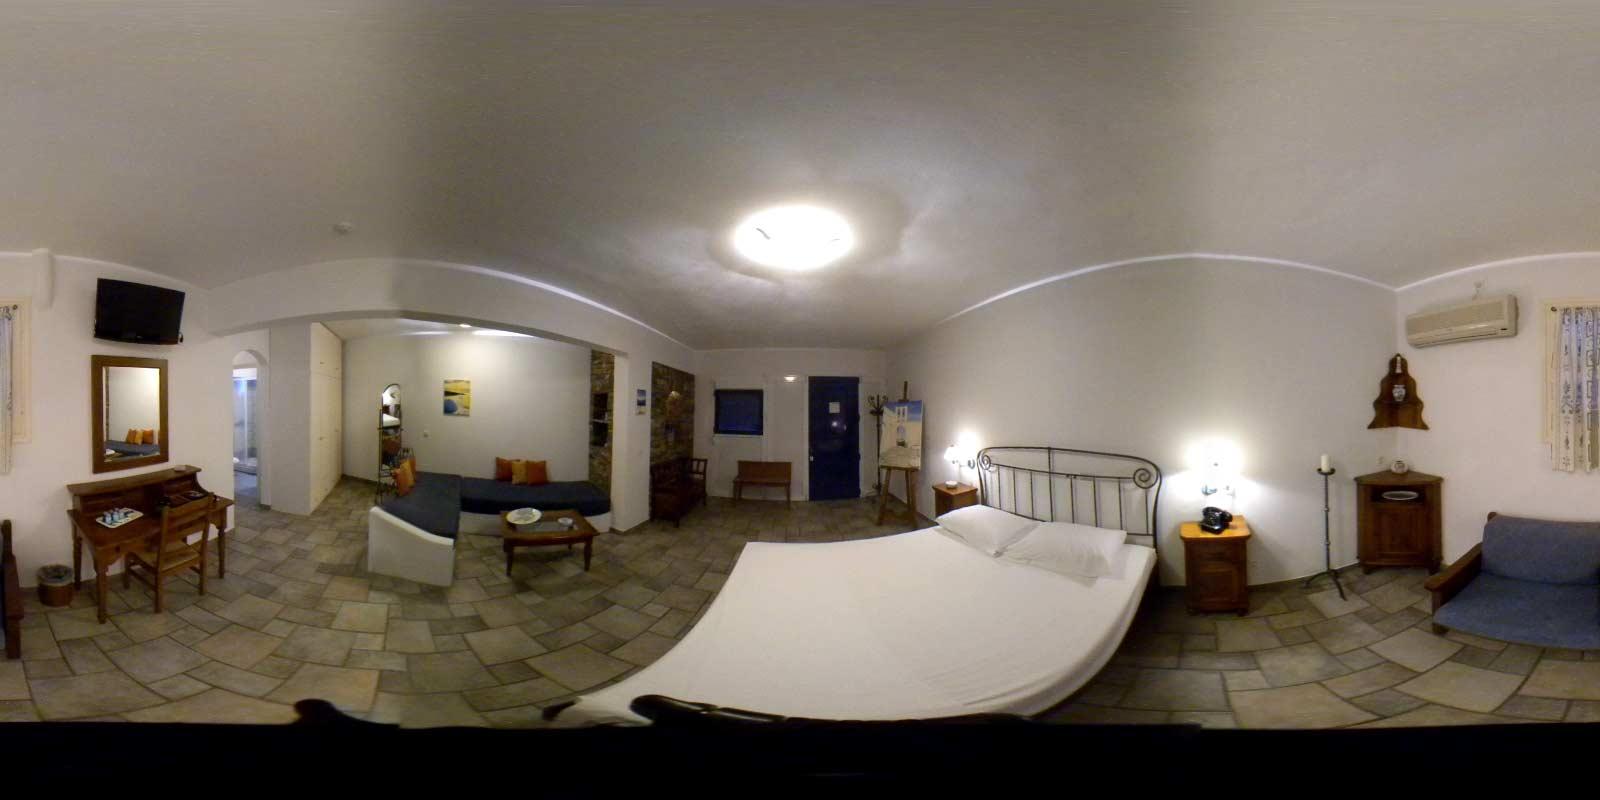 3 Star Sifnos Hotels 3 Star Sifnos Hotel Alexandros Photos